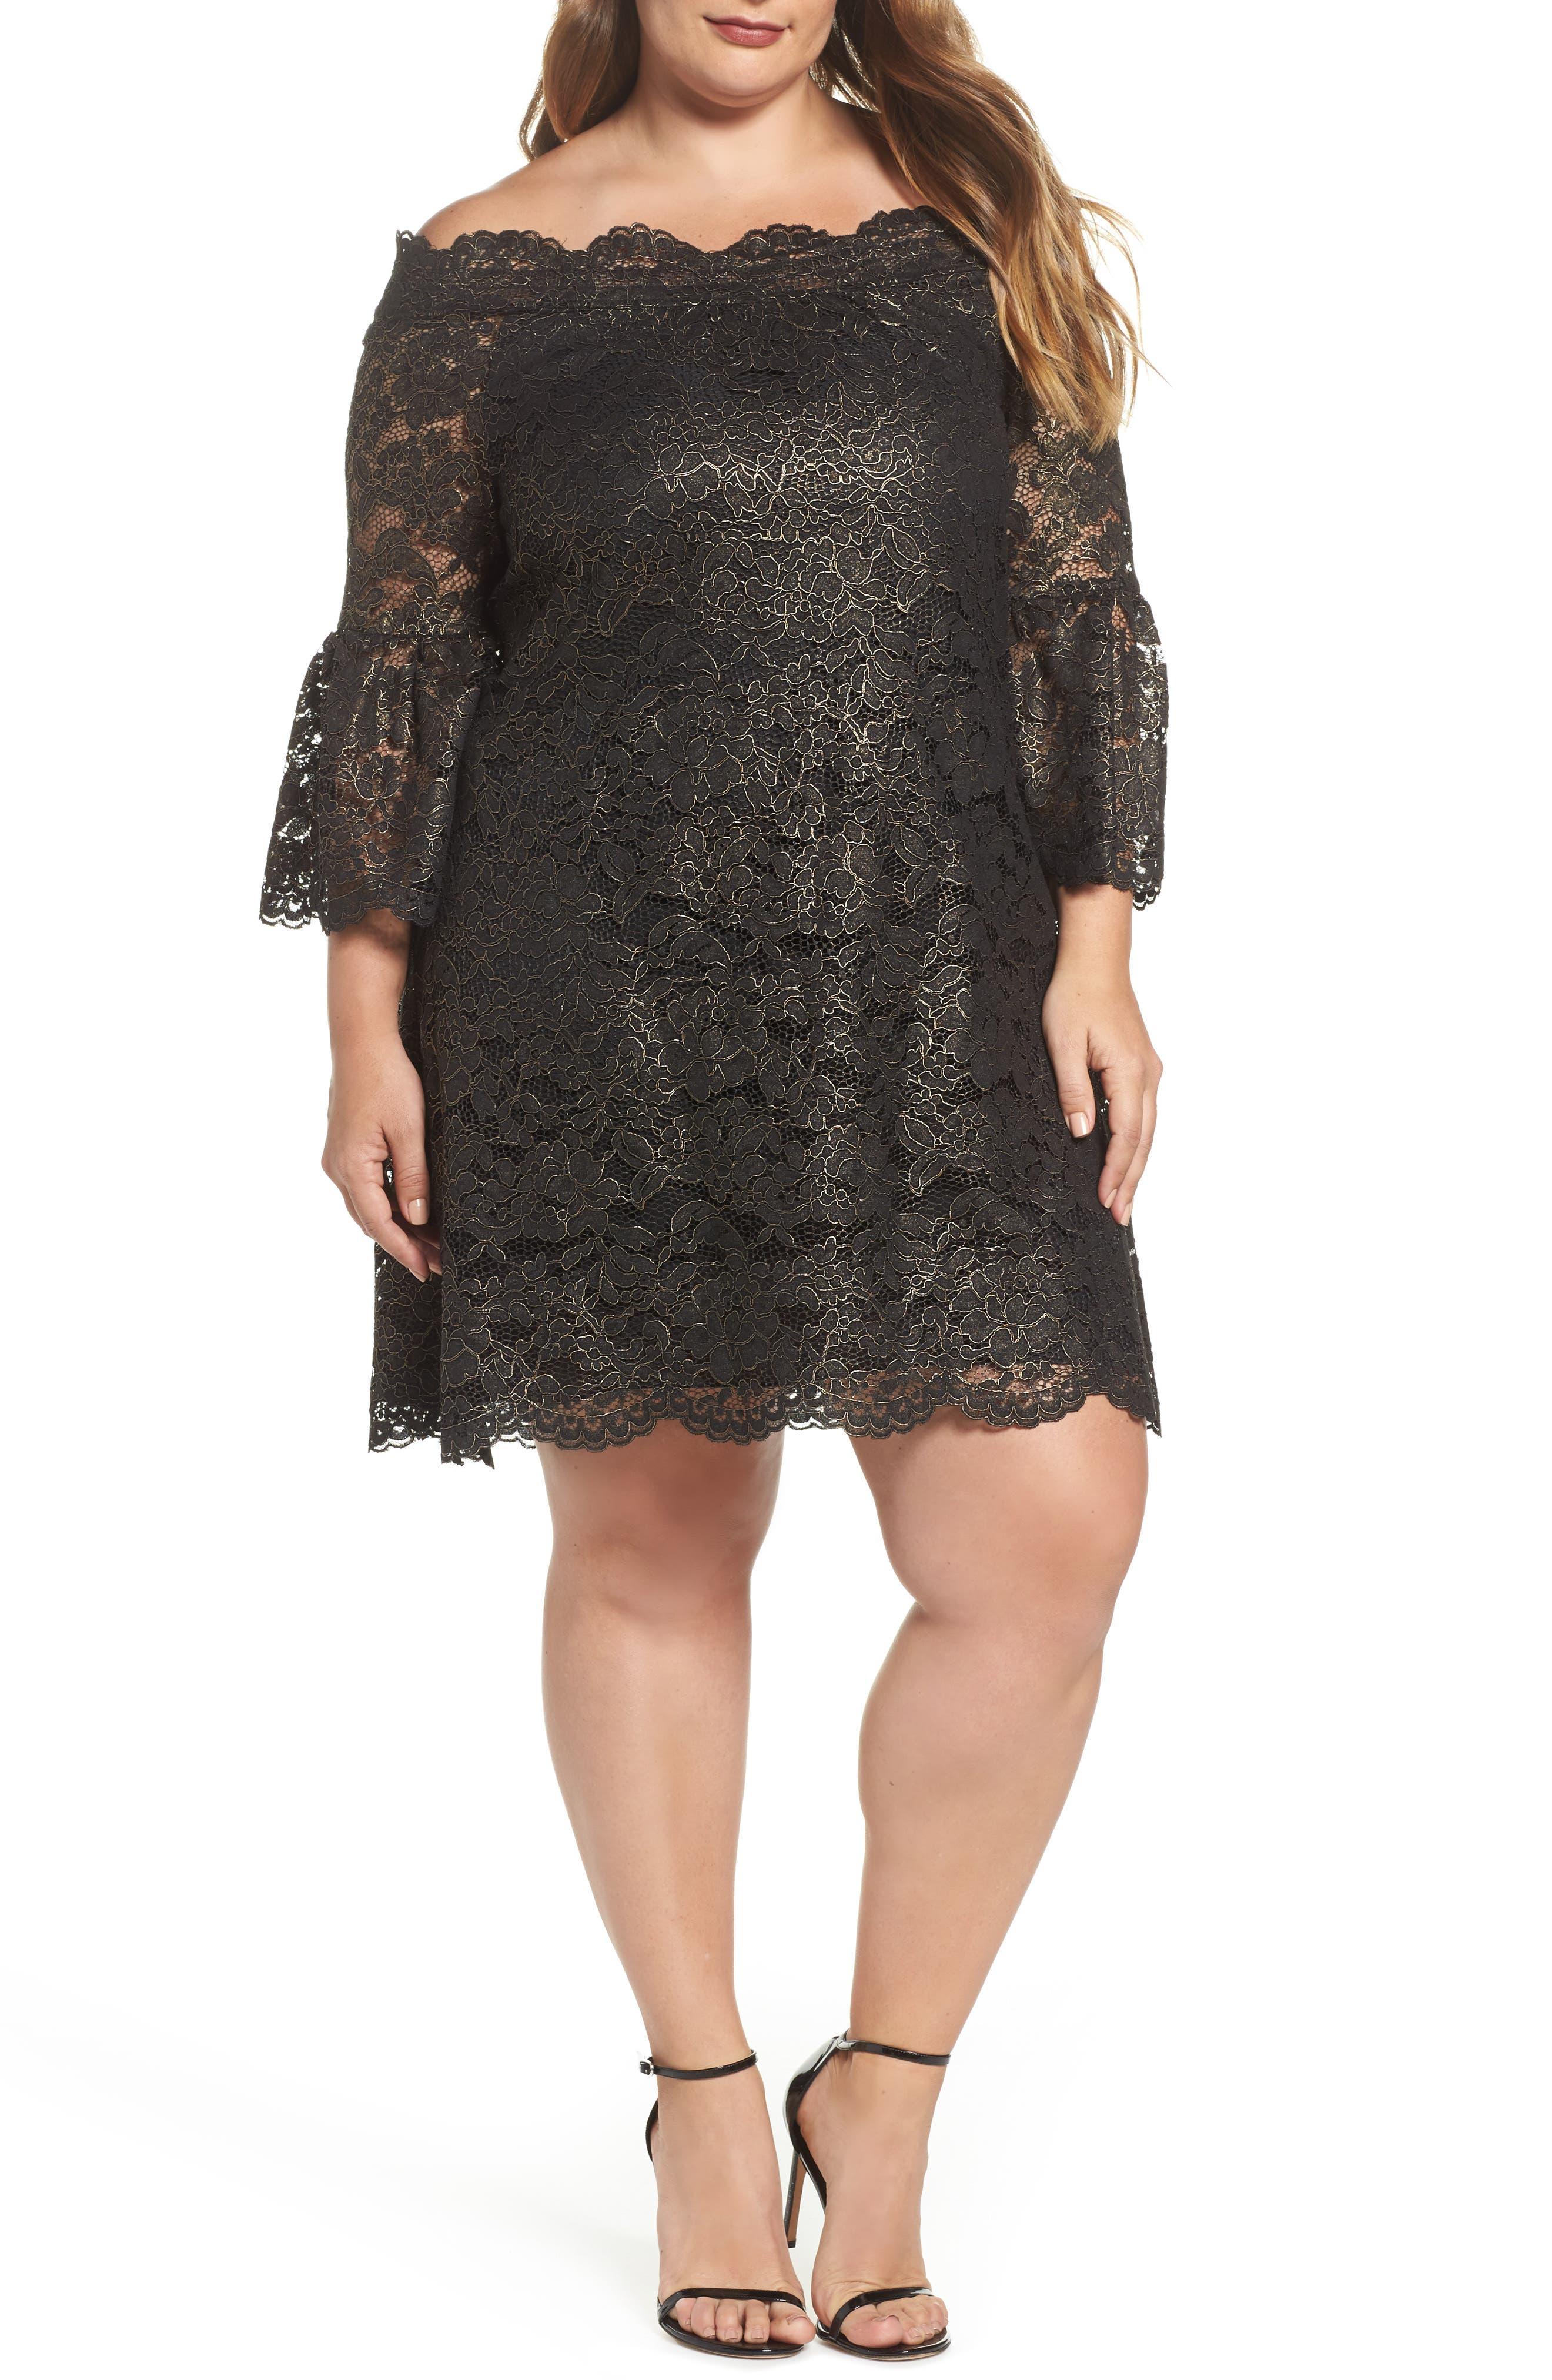 Off the Shoulder Black Gold Lace Dress,                             Main thumbnail 1, color,                             005